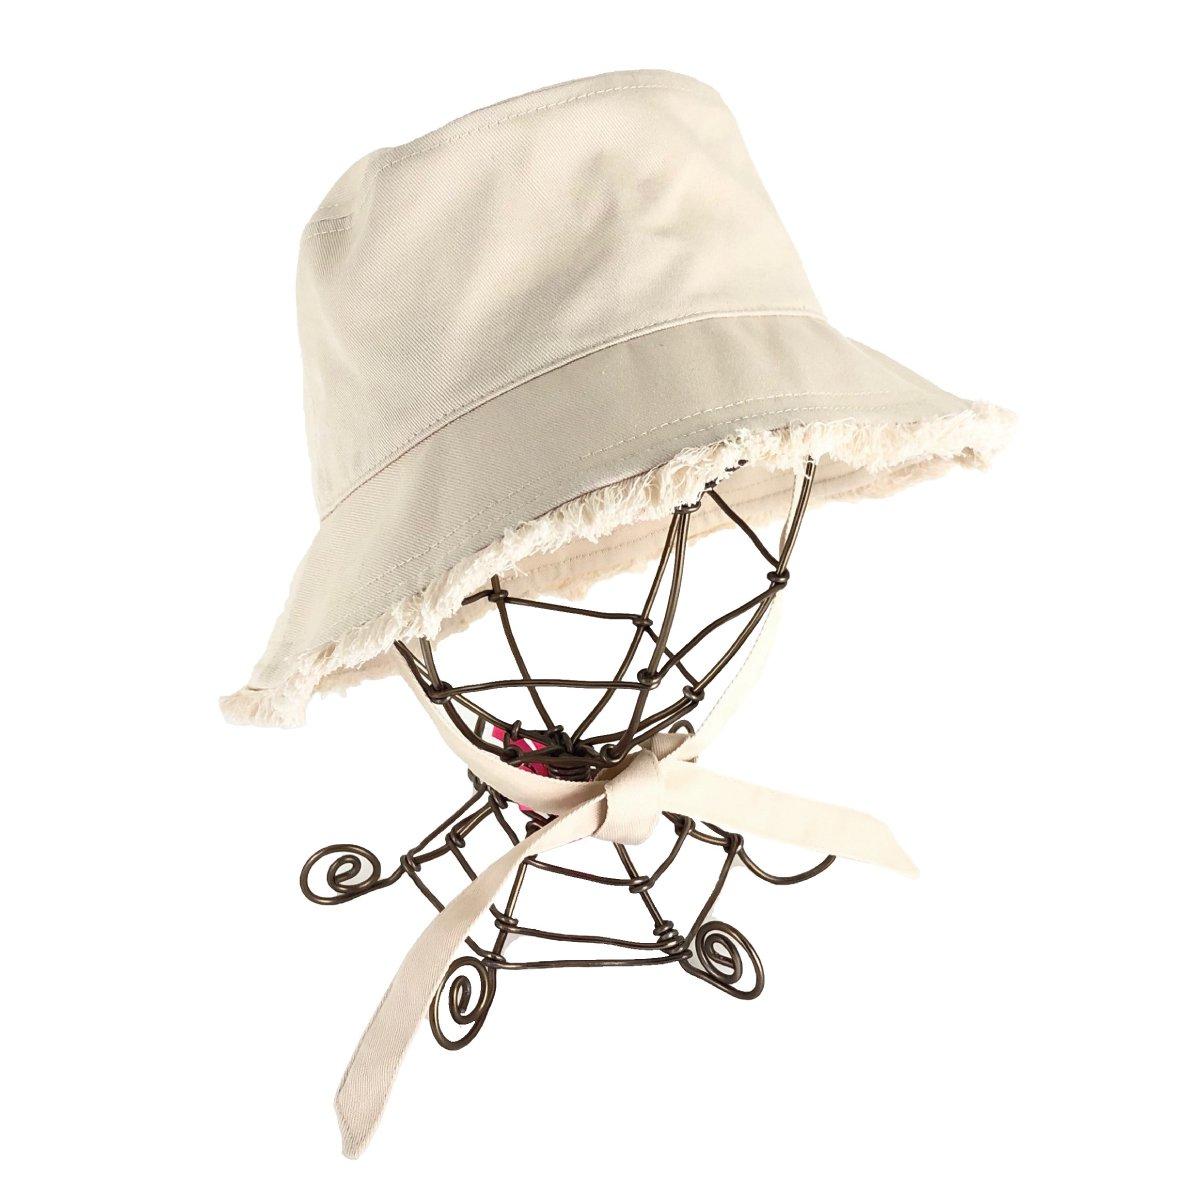 【KIDS】Kids Fringe Hat 詳細画像8